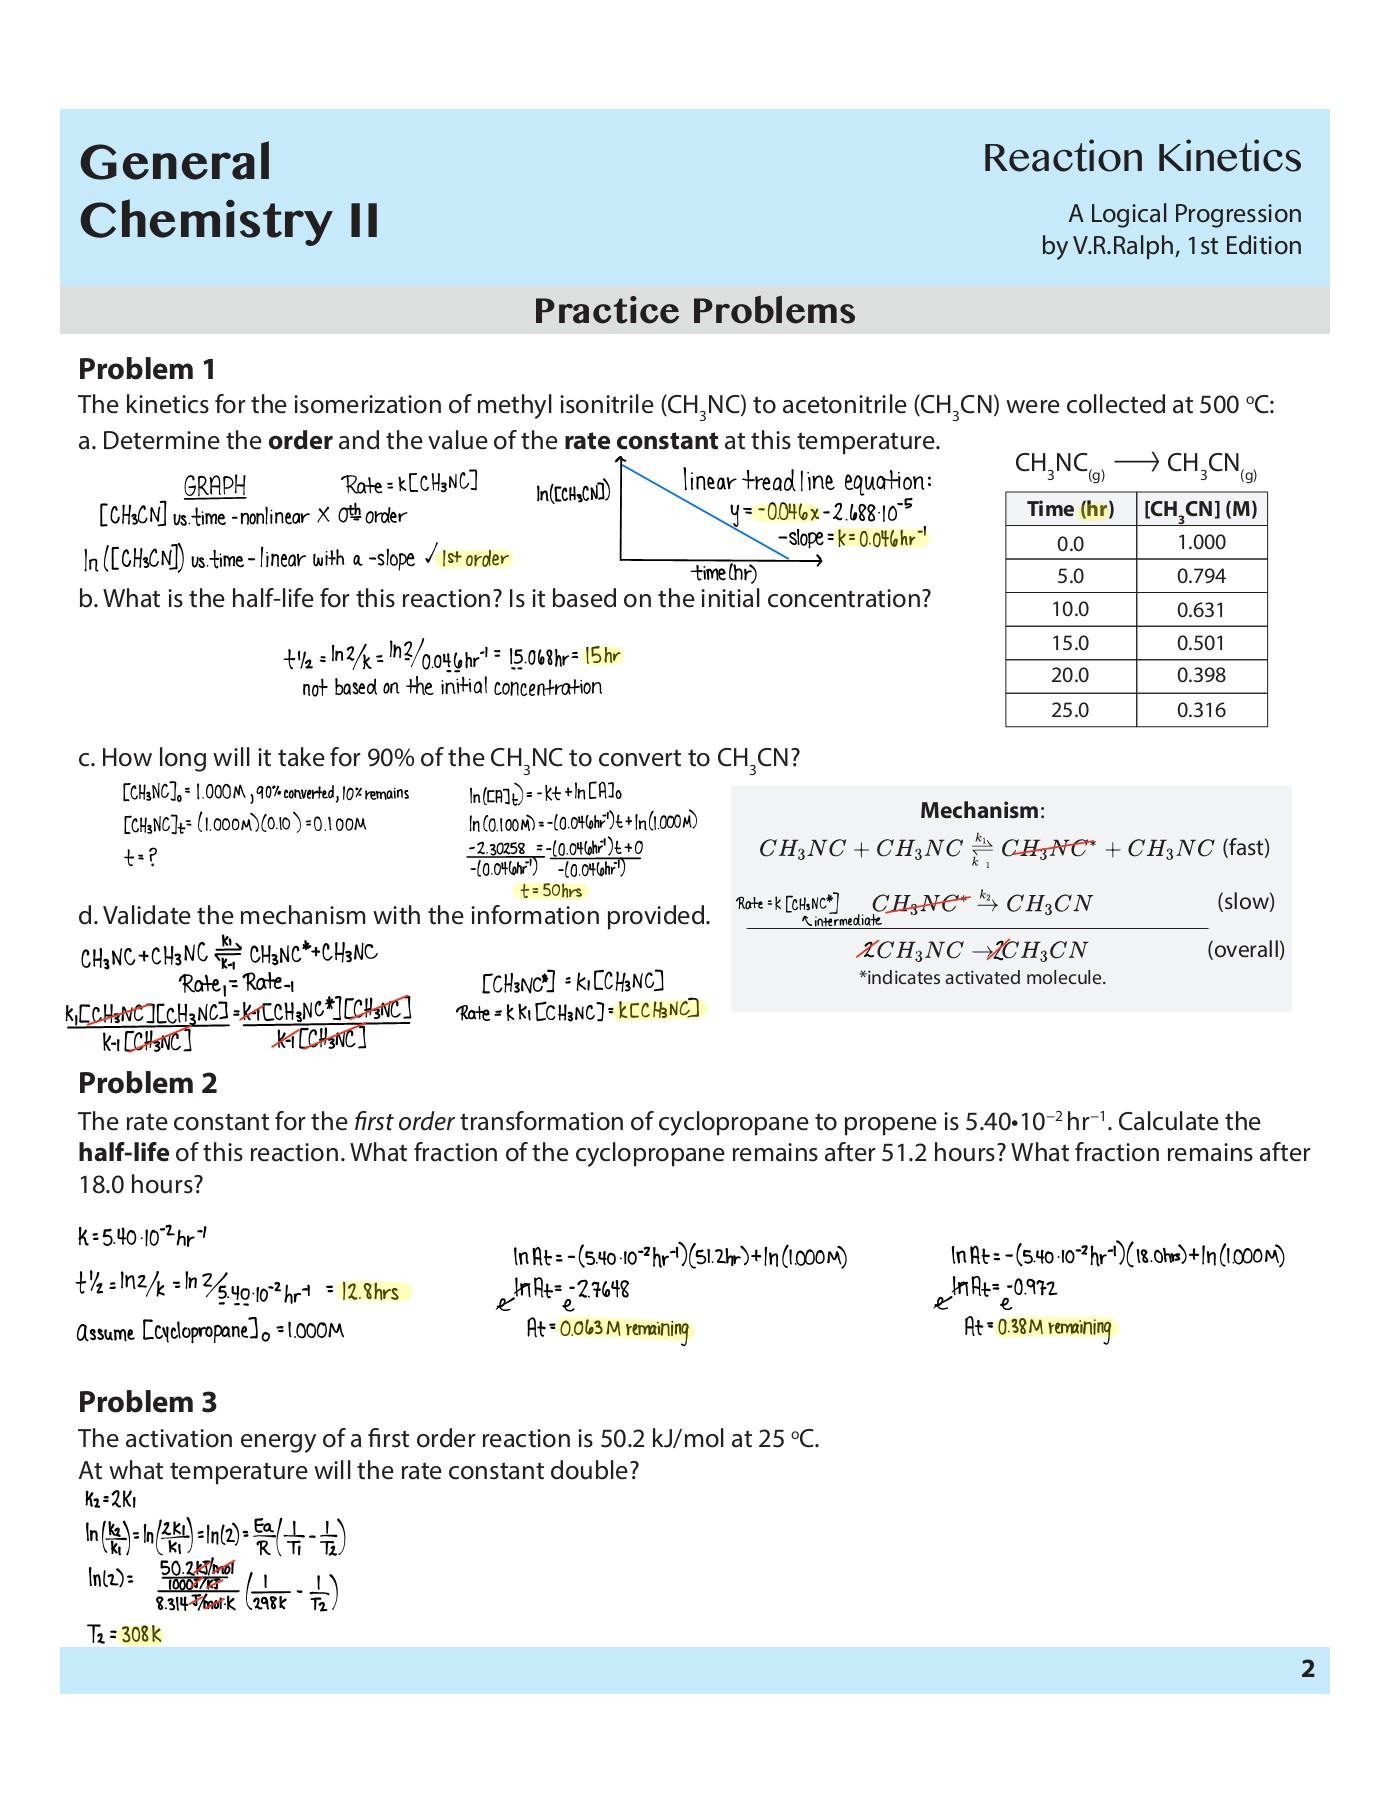 Chemical Kinetics Worksheet Answers